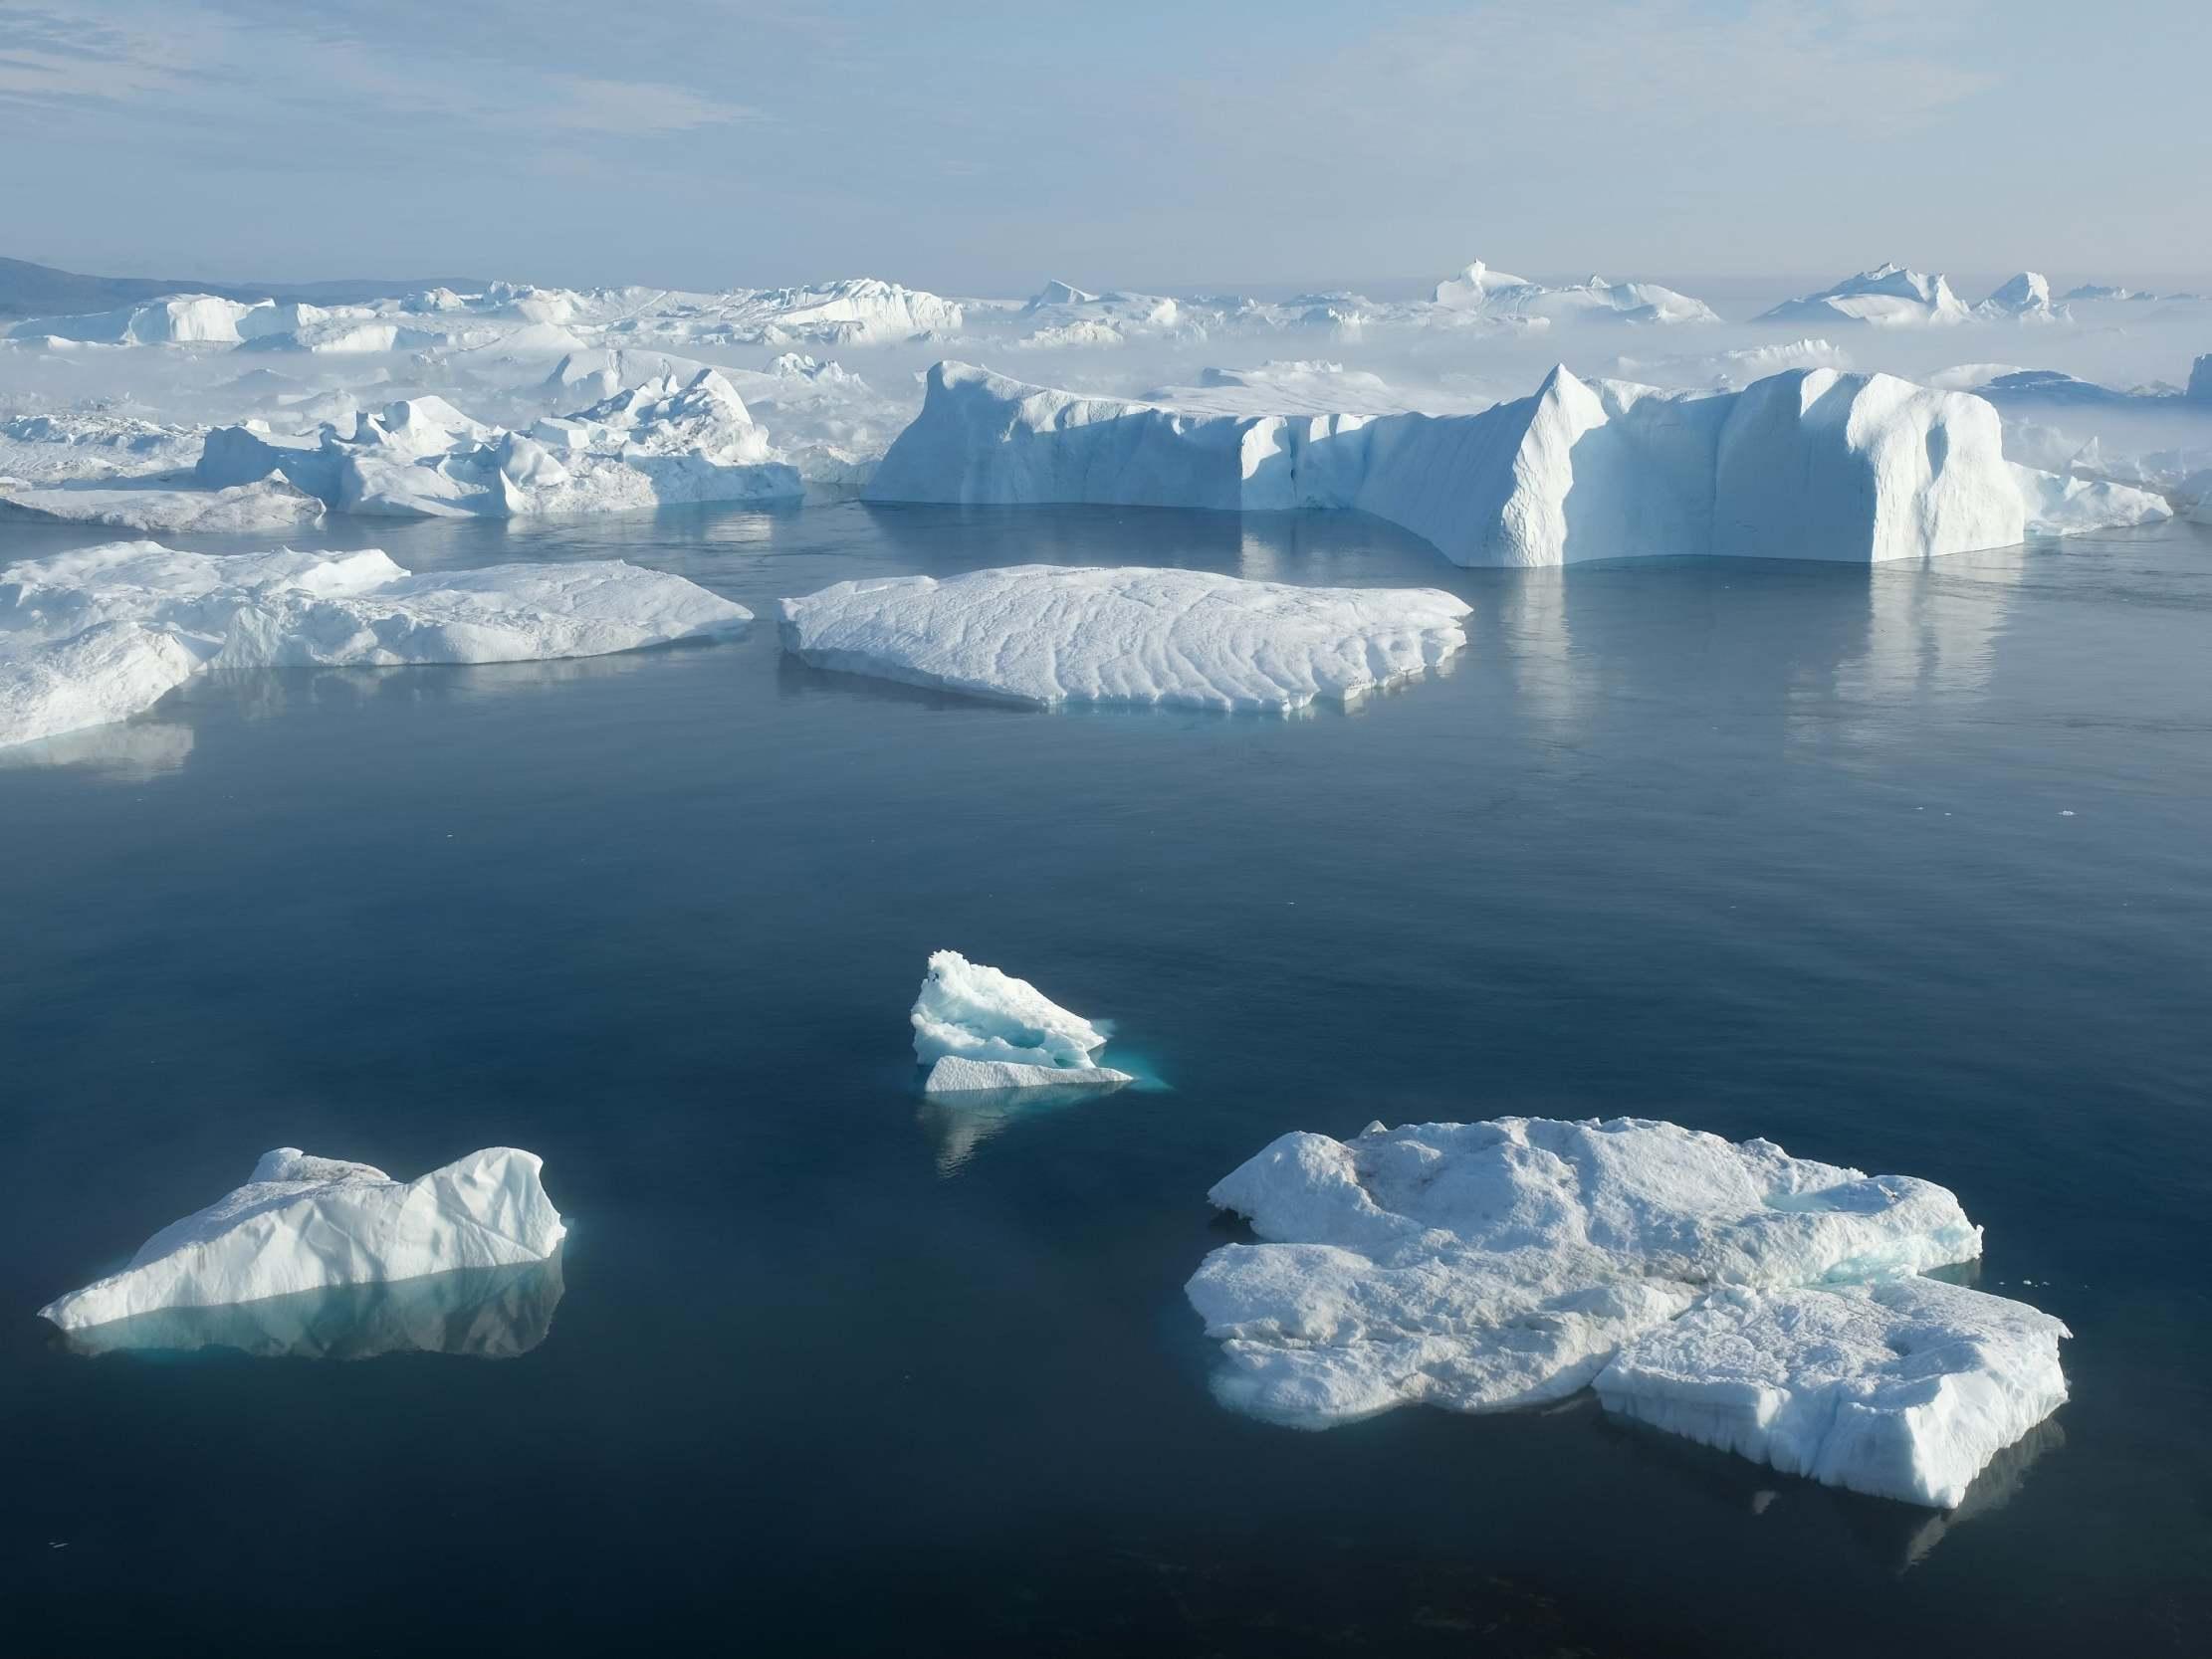 Melting Greenland ice sheet threatens coastal cities around world, scientist warns